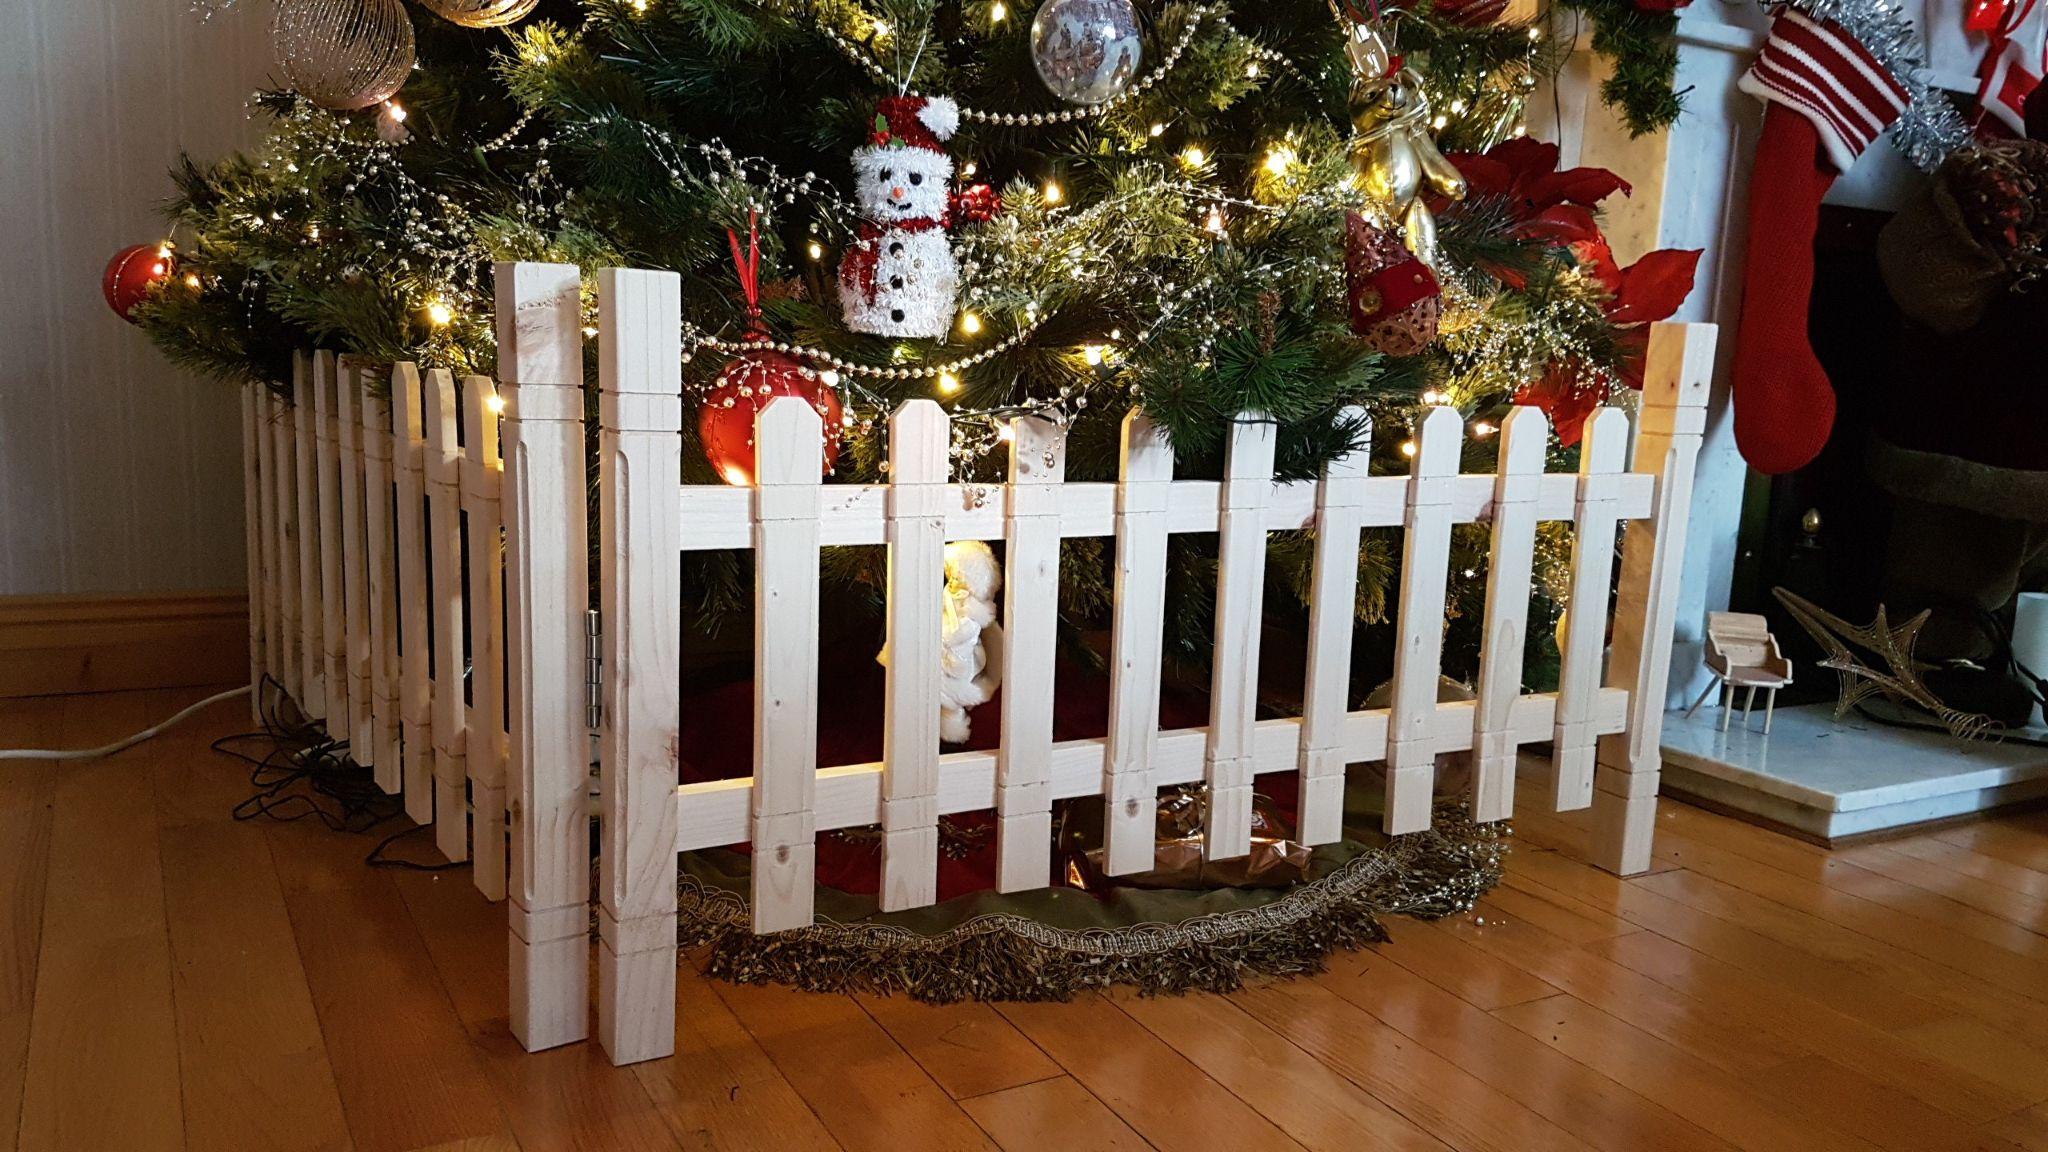 Create a Christmas tree barrier